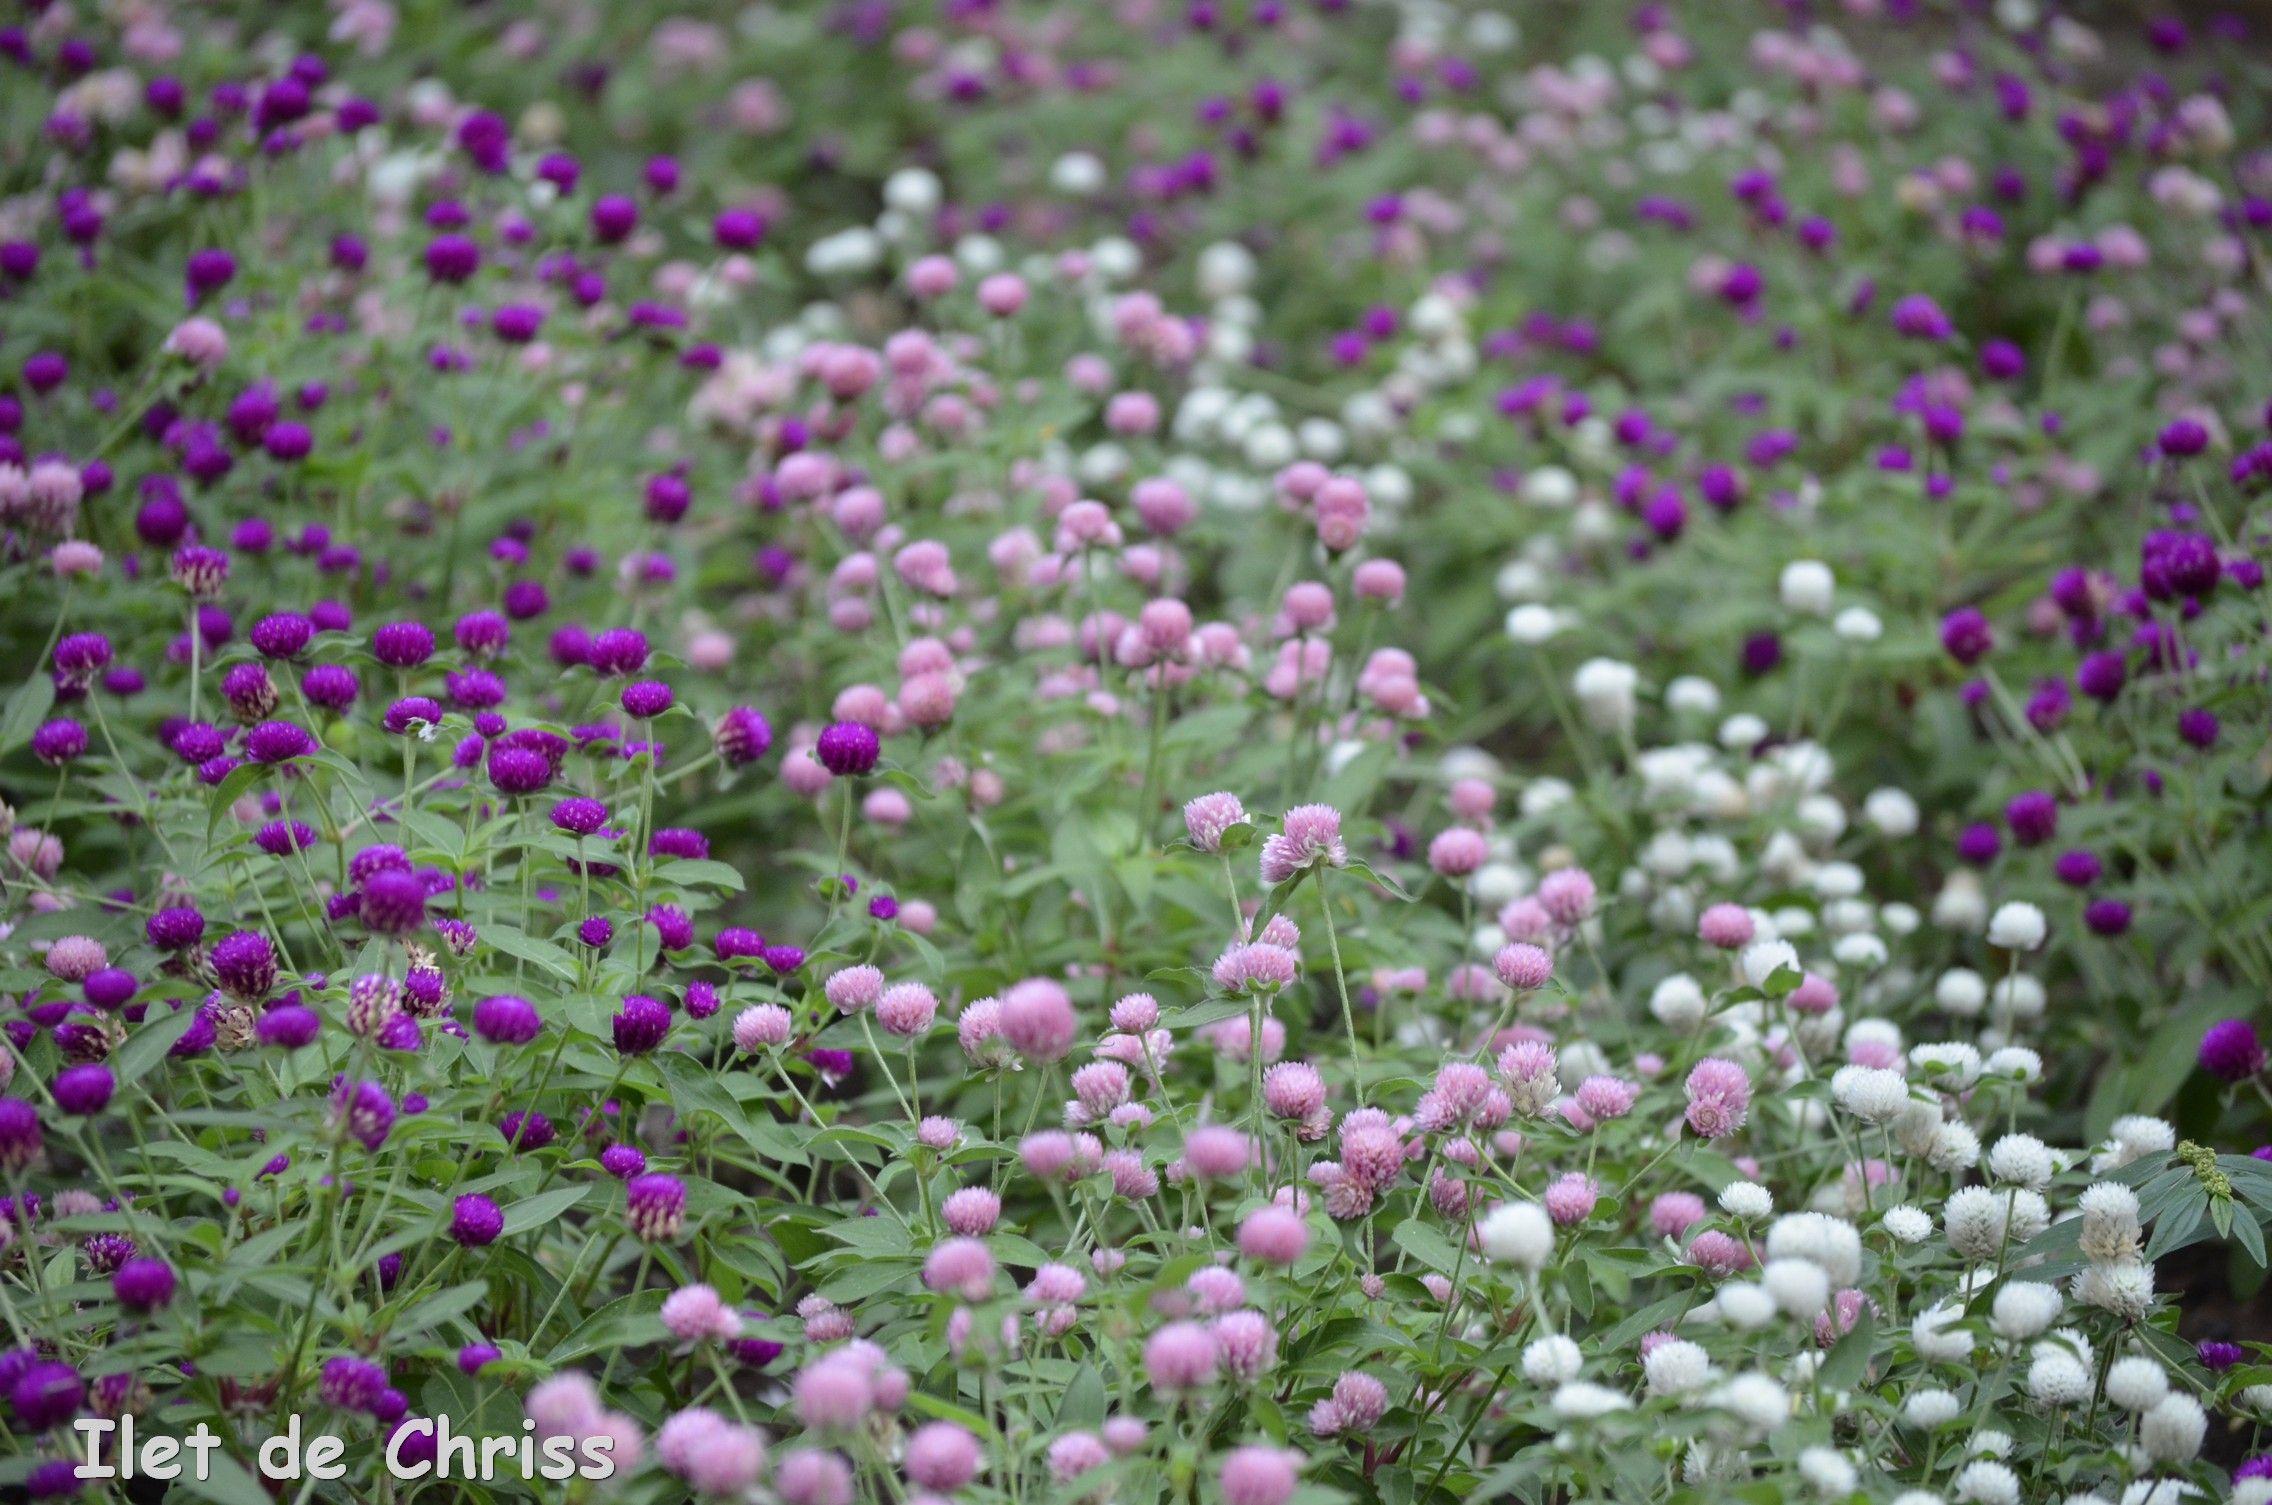 Tapis fleuri, Jardin de l'Etat, Saint Denis